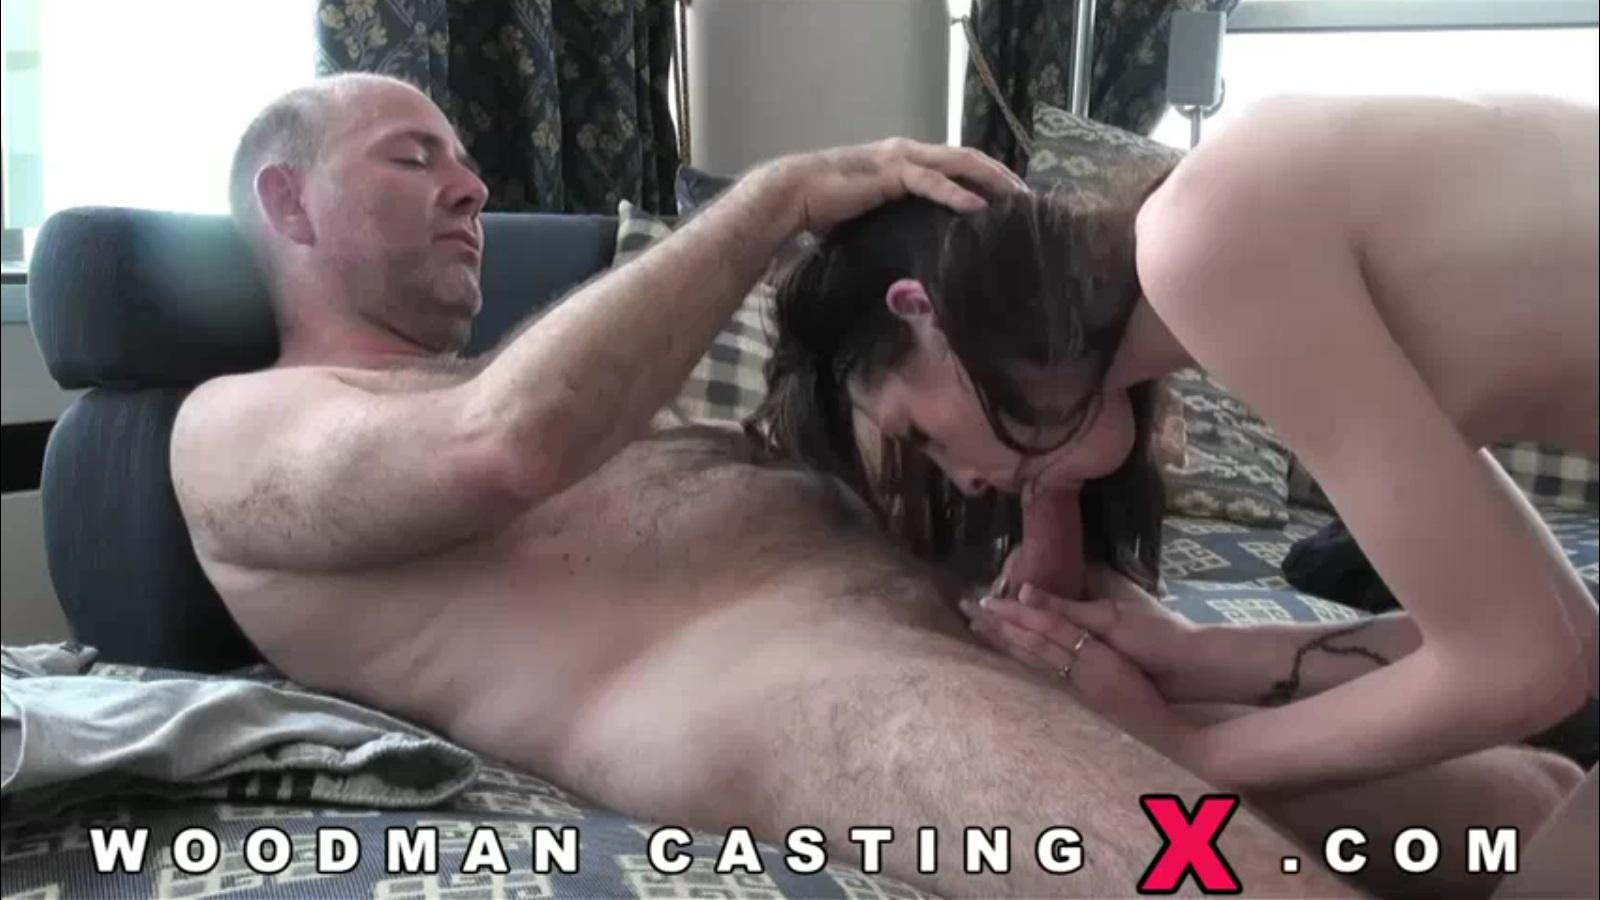 Pierre Woodman Casting X